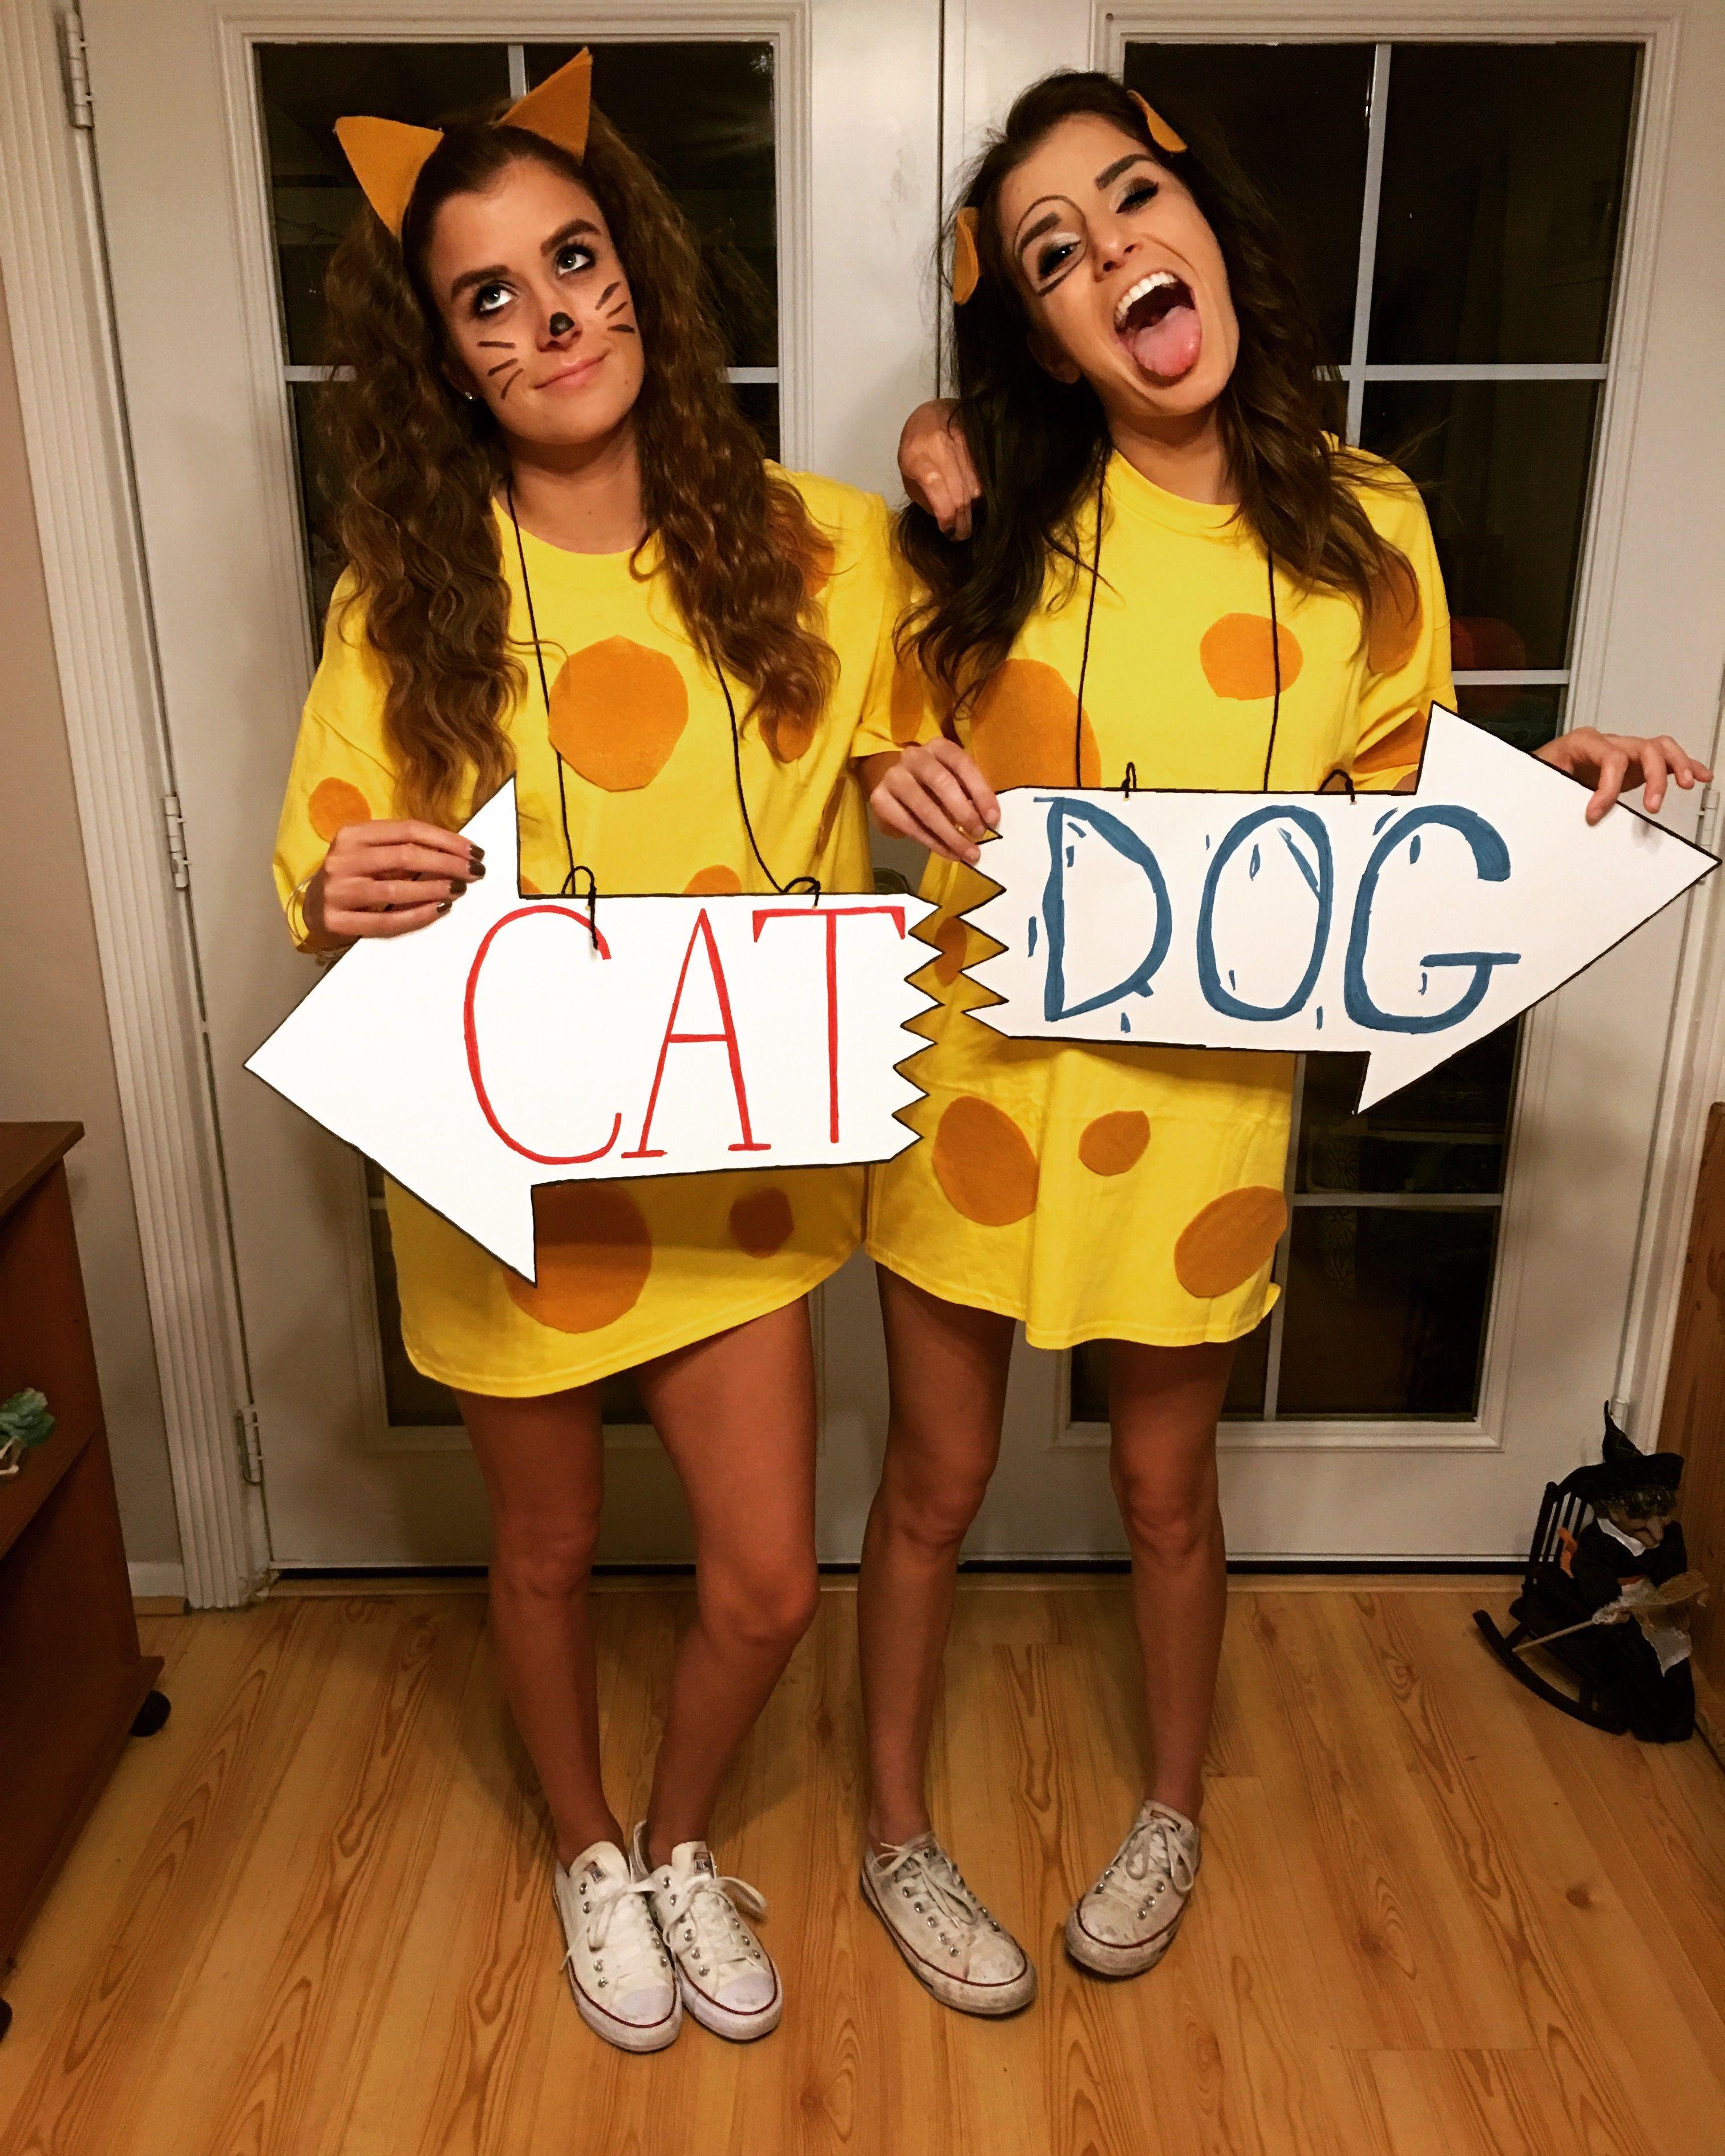 Cat Dog Halloween Costume Insta Saraolivass Cartoon Halloween